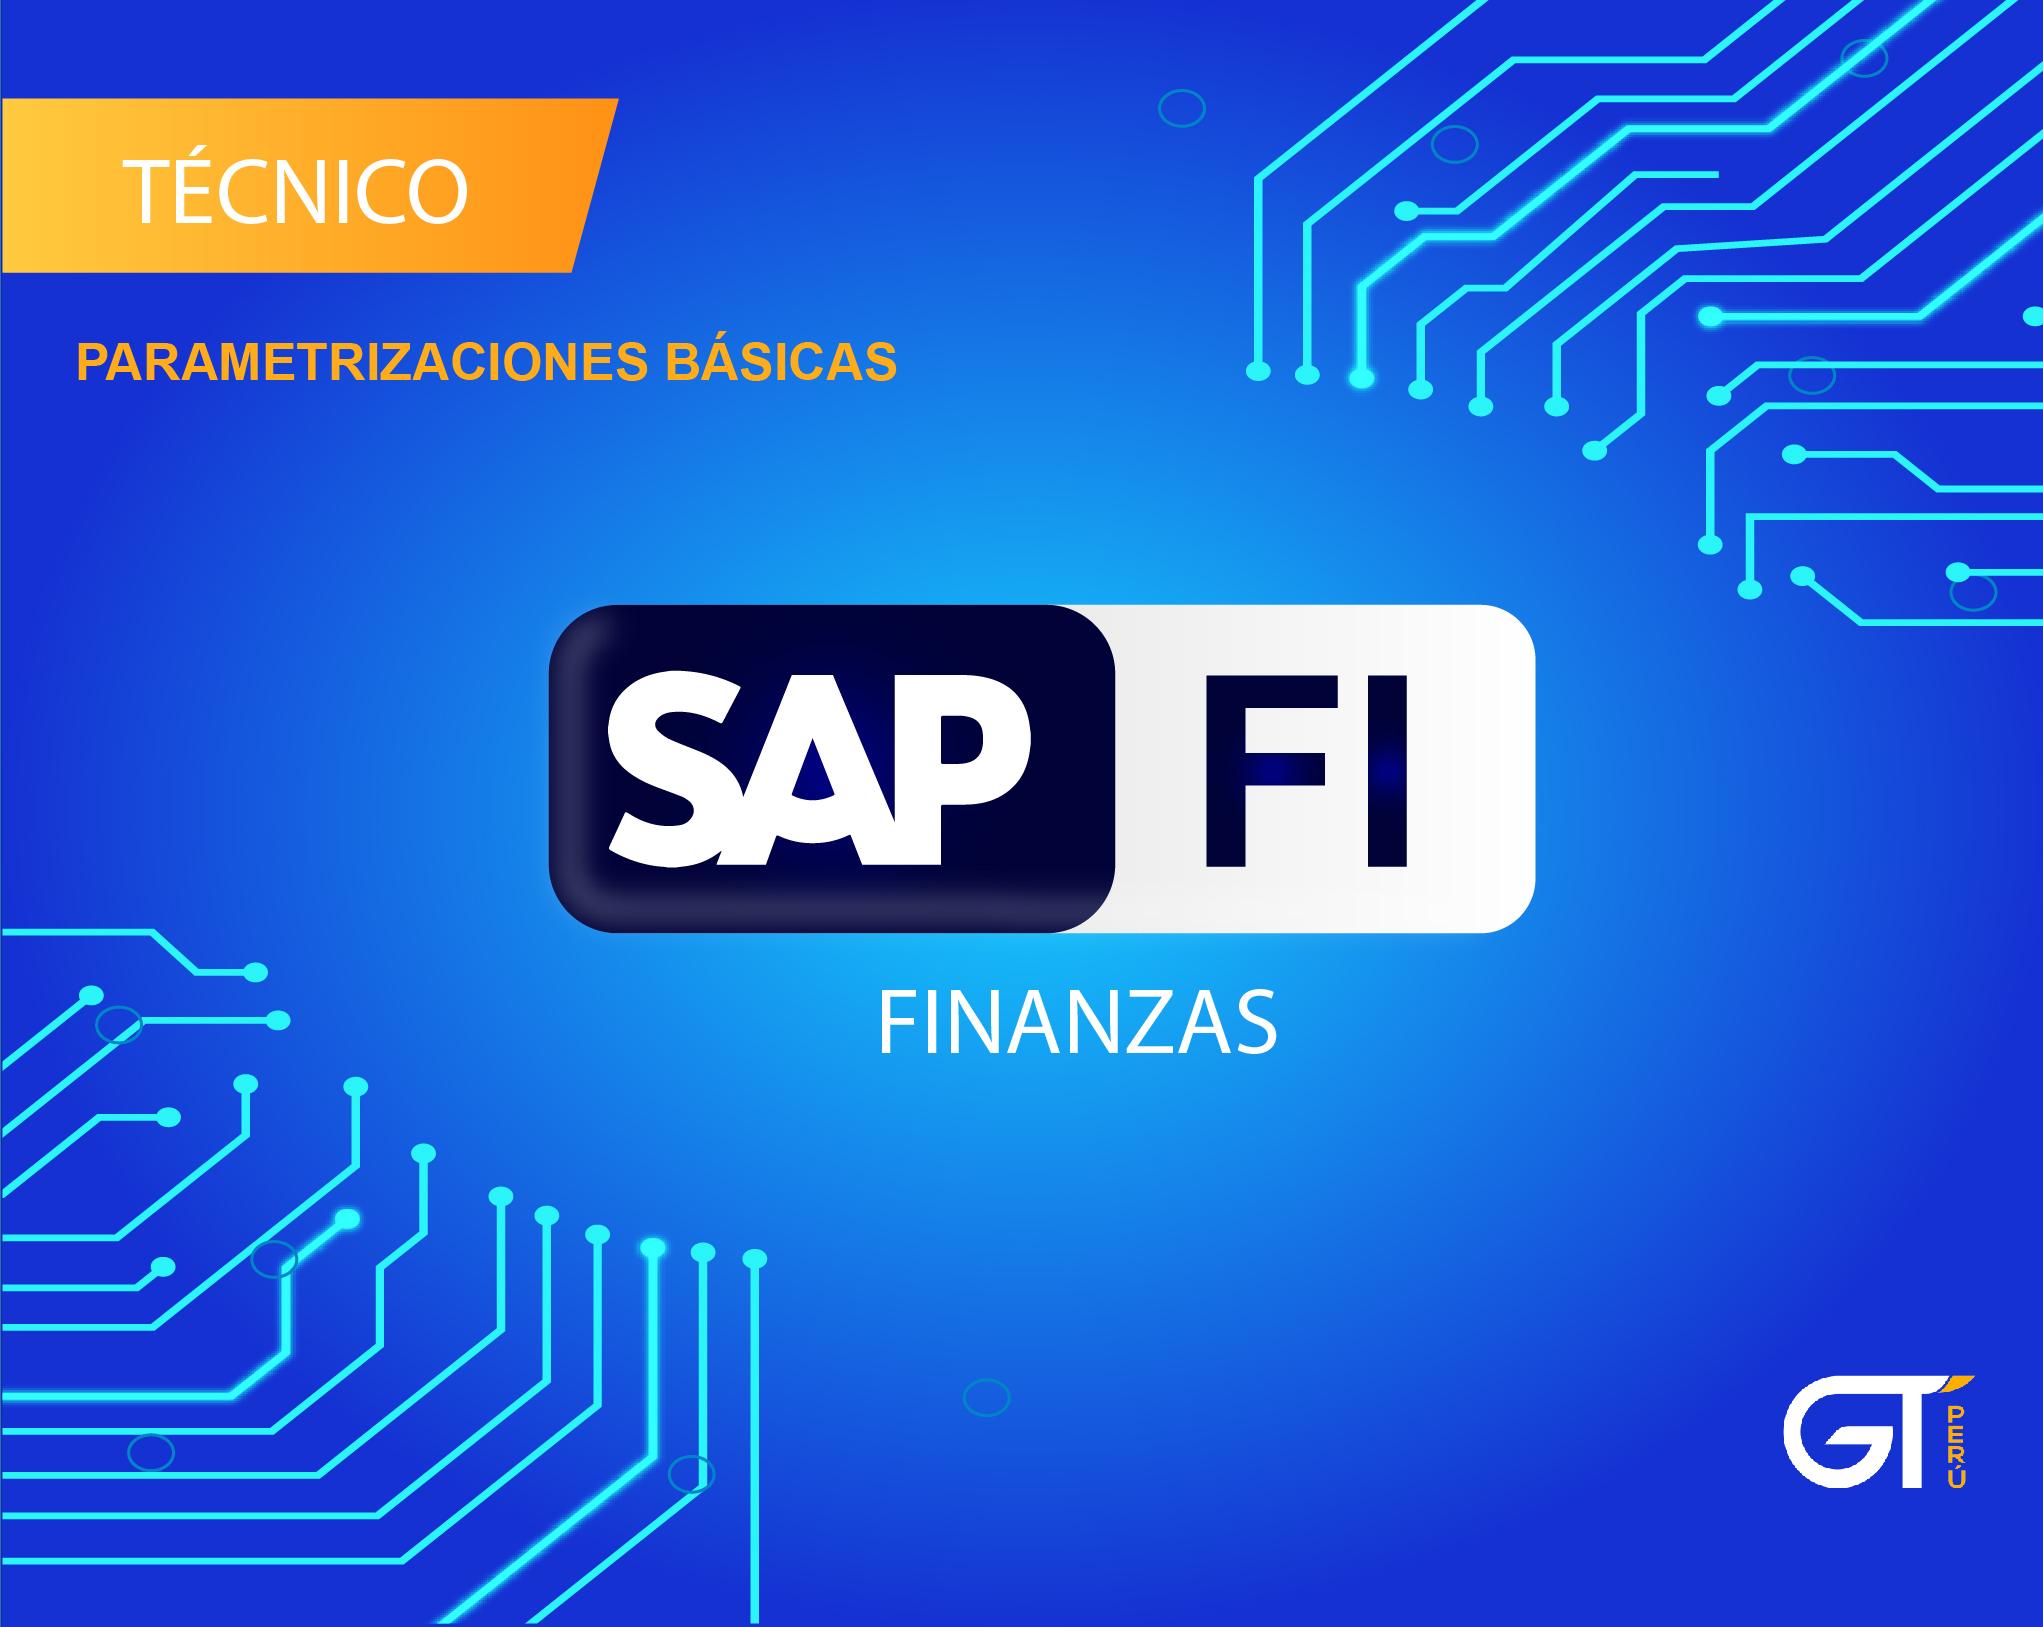 SAP_FI